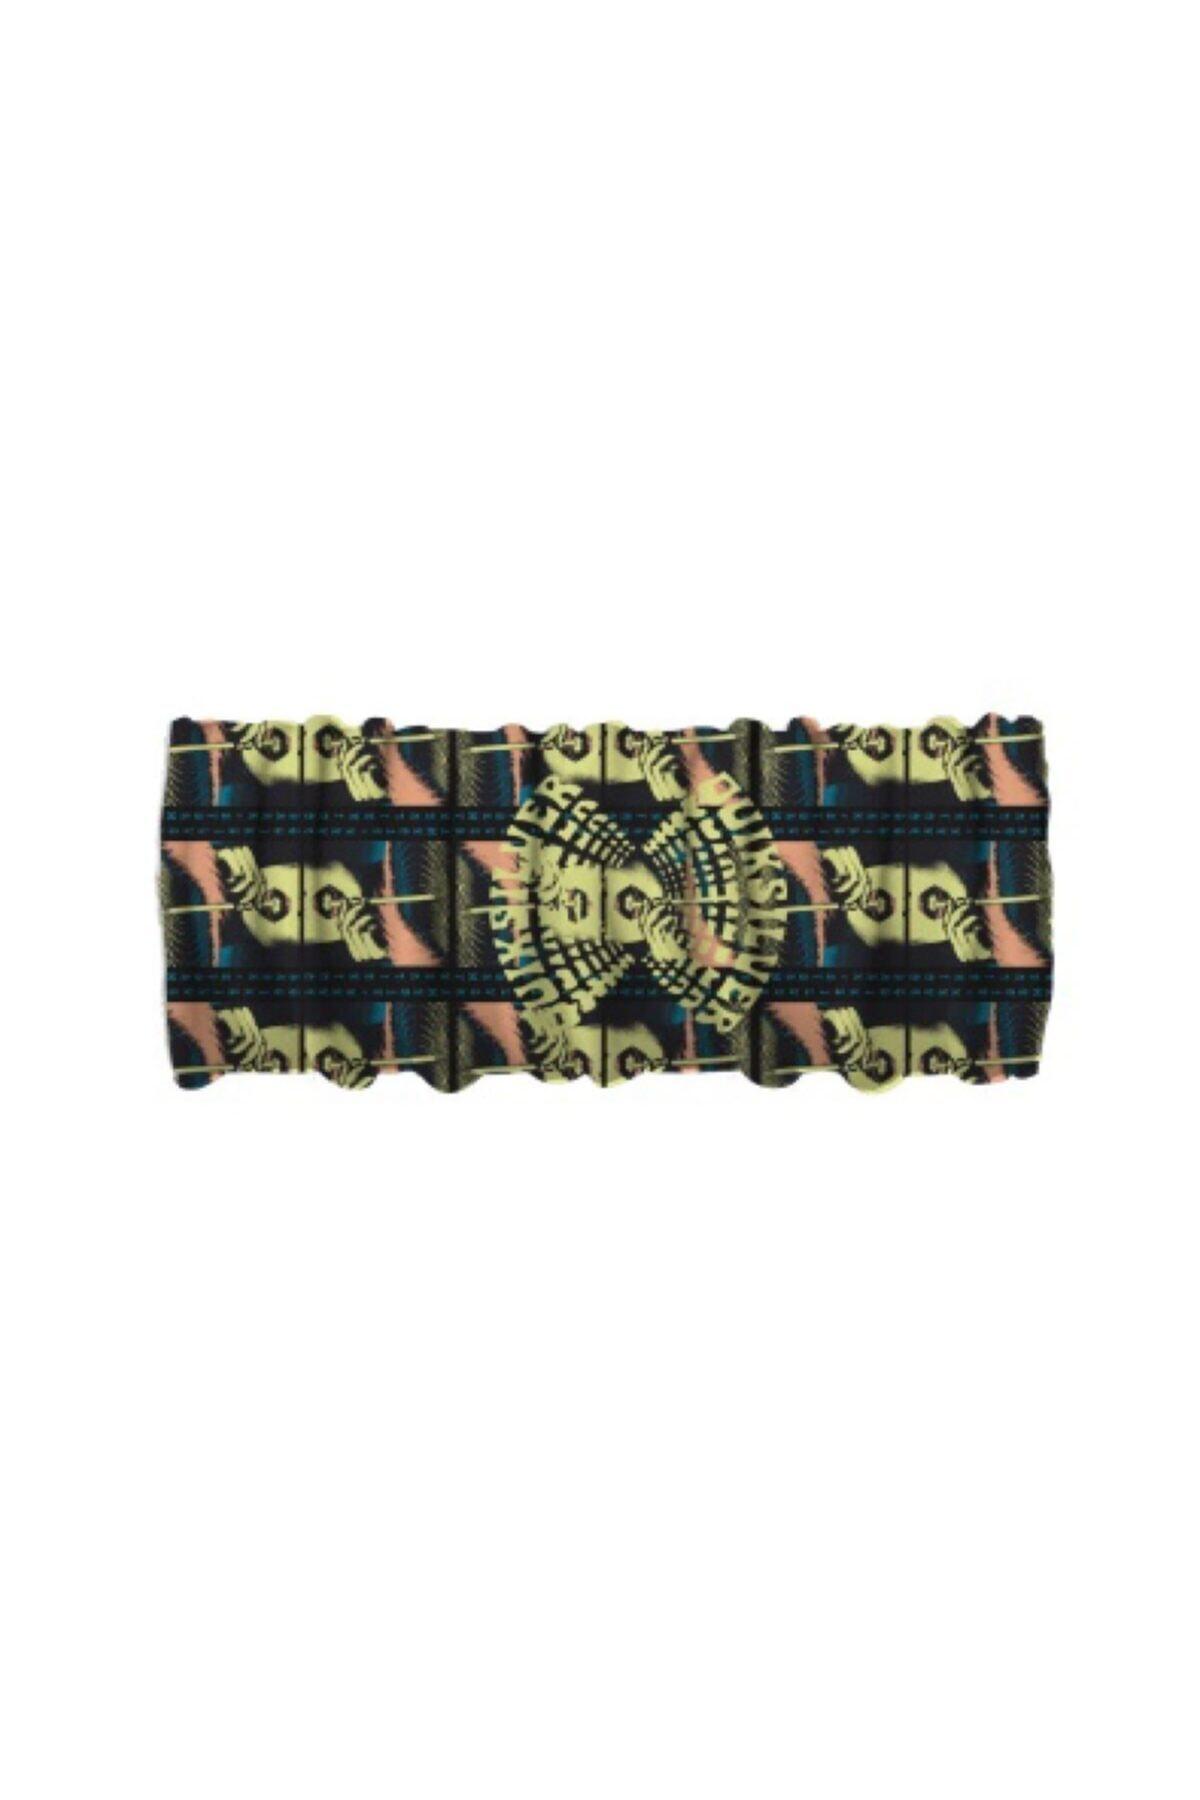 Quiksilver Siyah Sarı Bandana 1